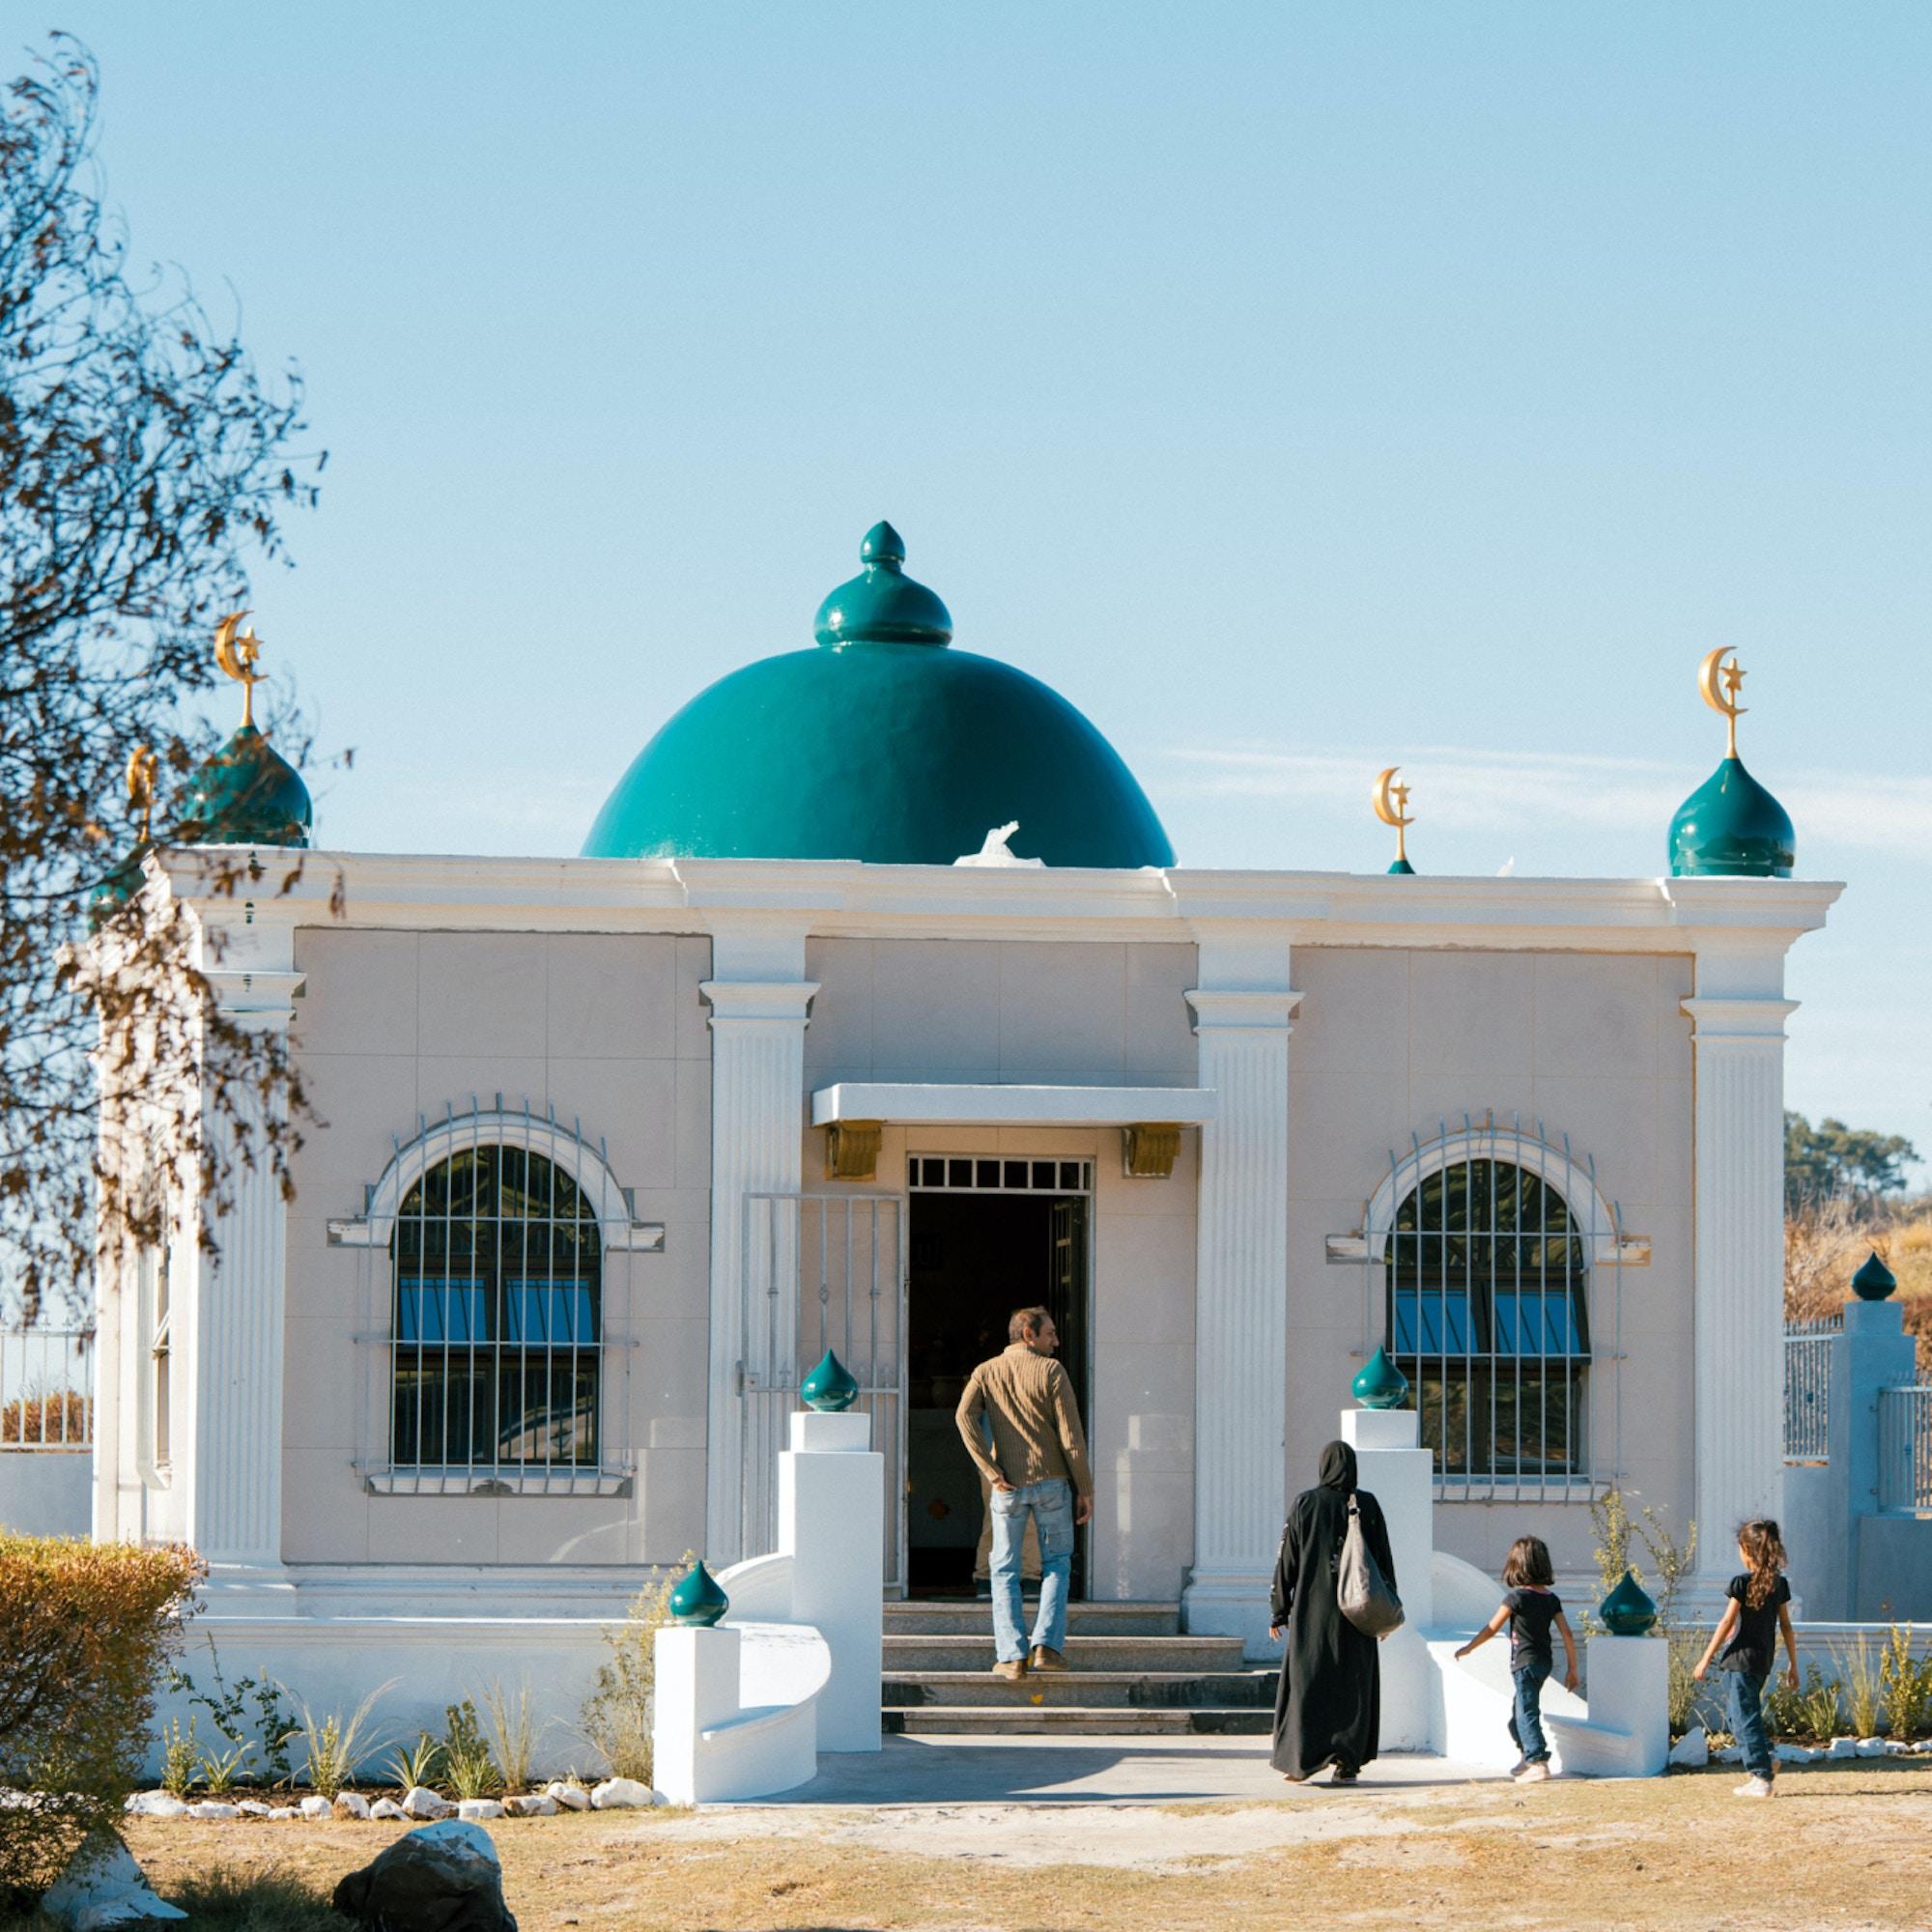 The Kramat of Sheikh Mohammed Hassen Ghaibie Shah al Qadri on Signal Hill